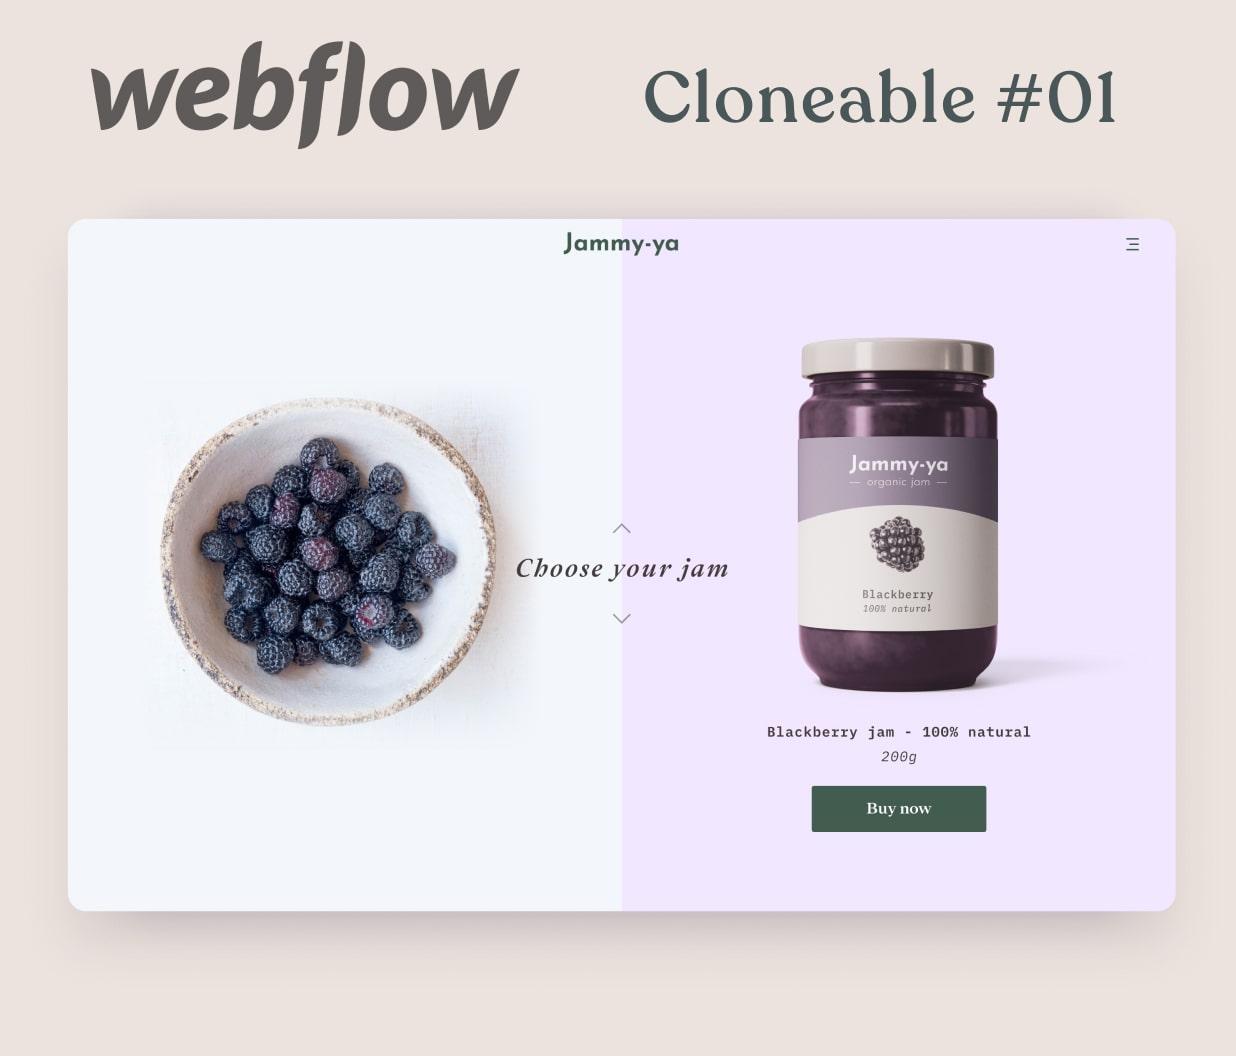 Webpage mockup of organic jam products